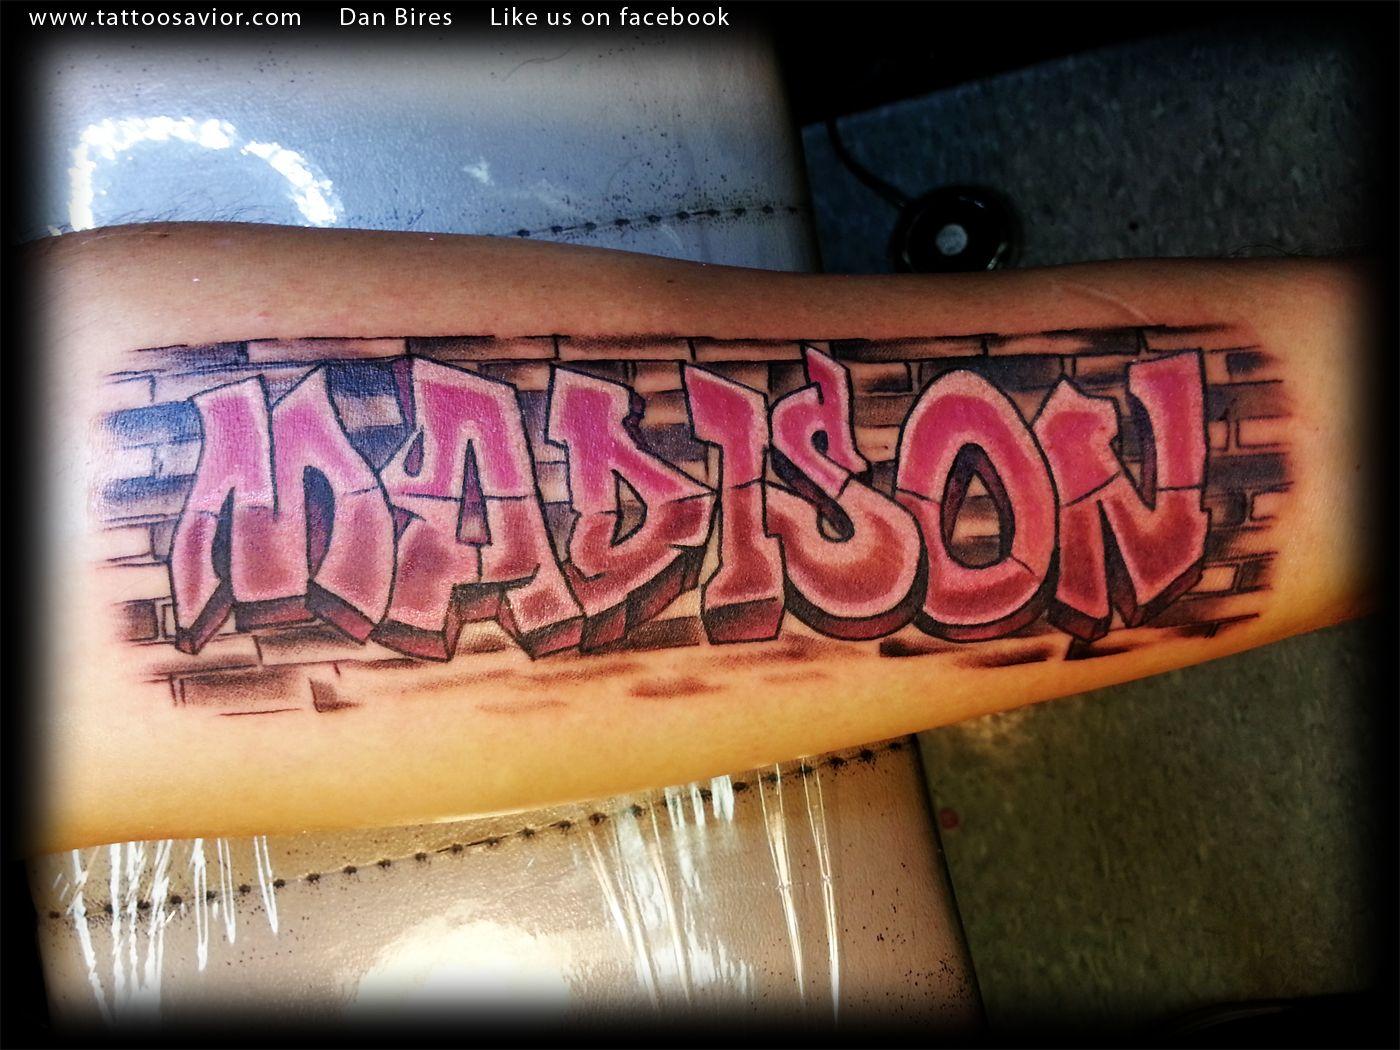 Graffiti art tattoo - Body Art Graffiti Name And Brick Wall Tattoo